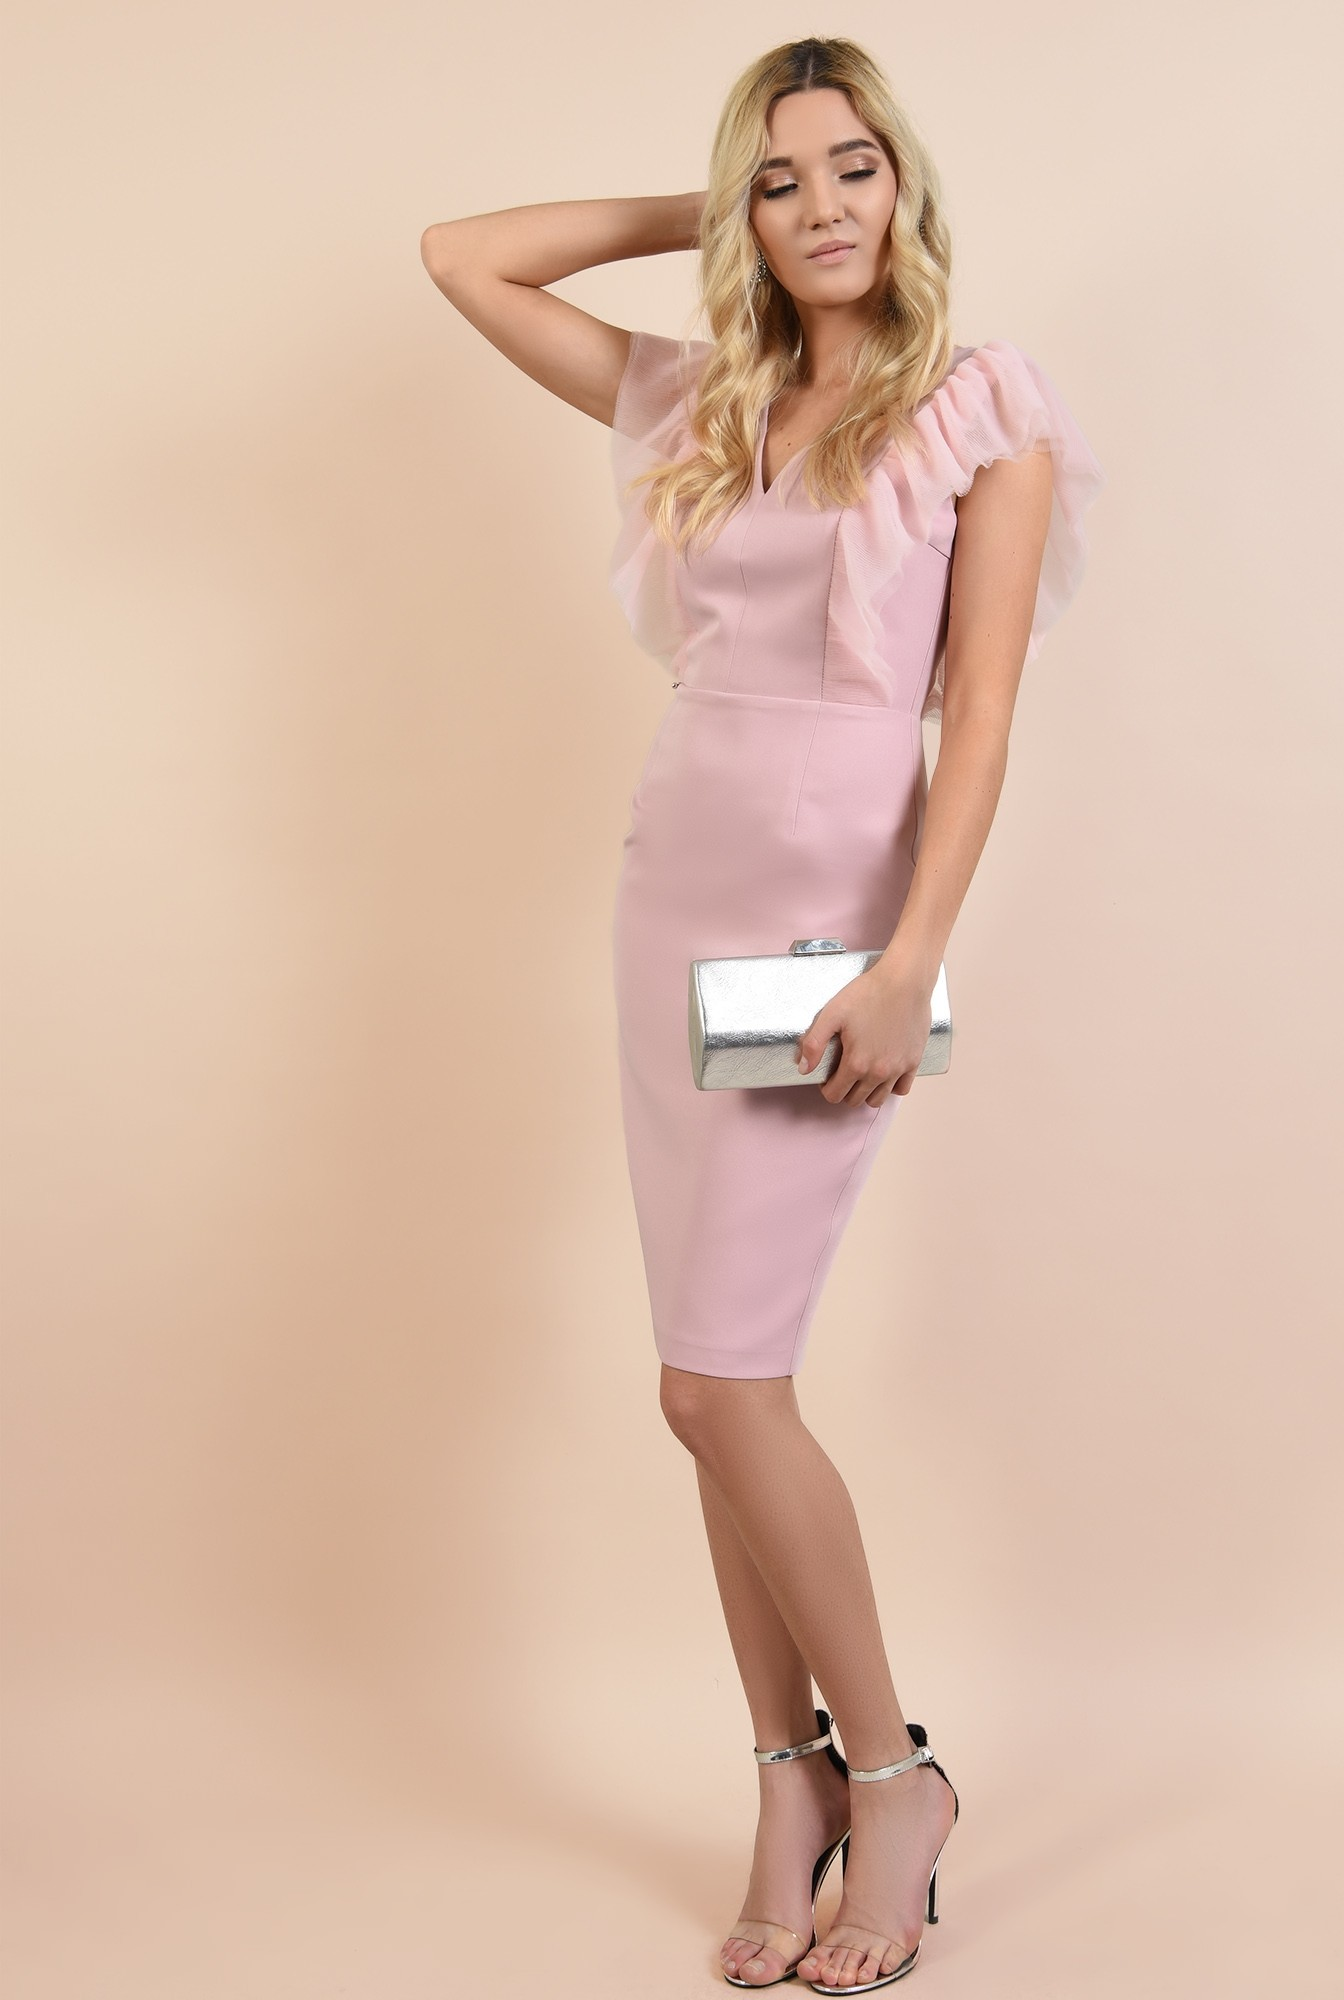 3 - rochie de seara, roz, bodycon, anchior, cusatura in talie, Poema